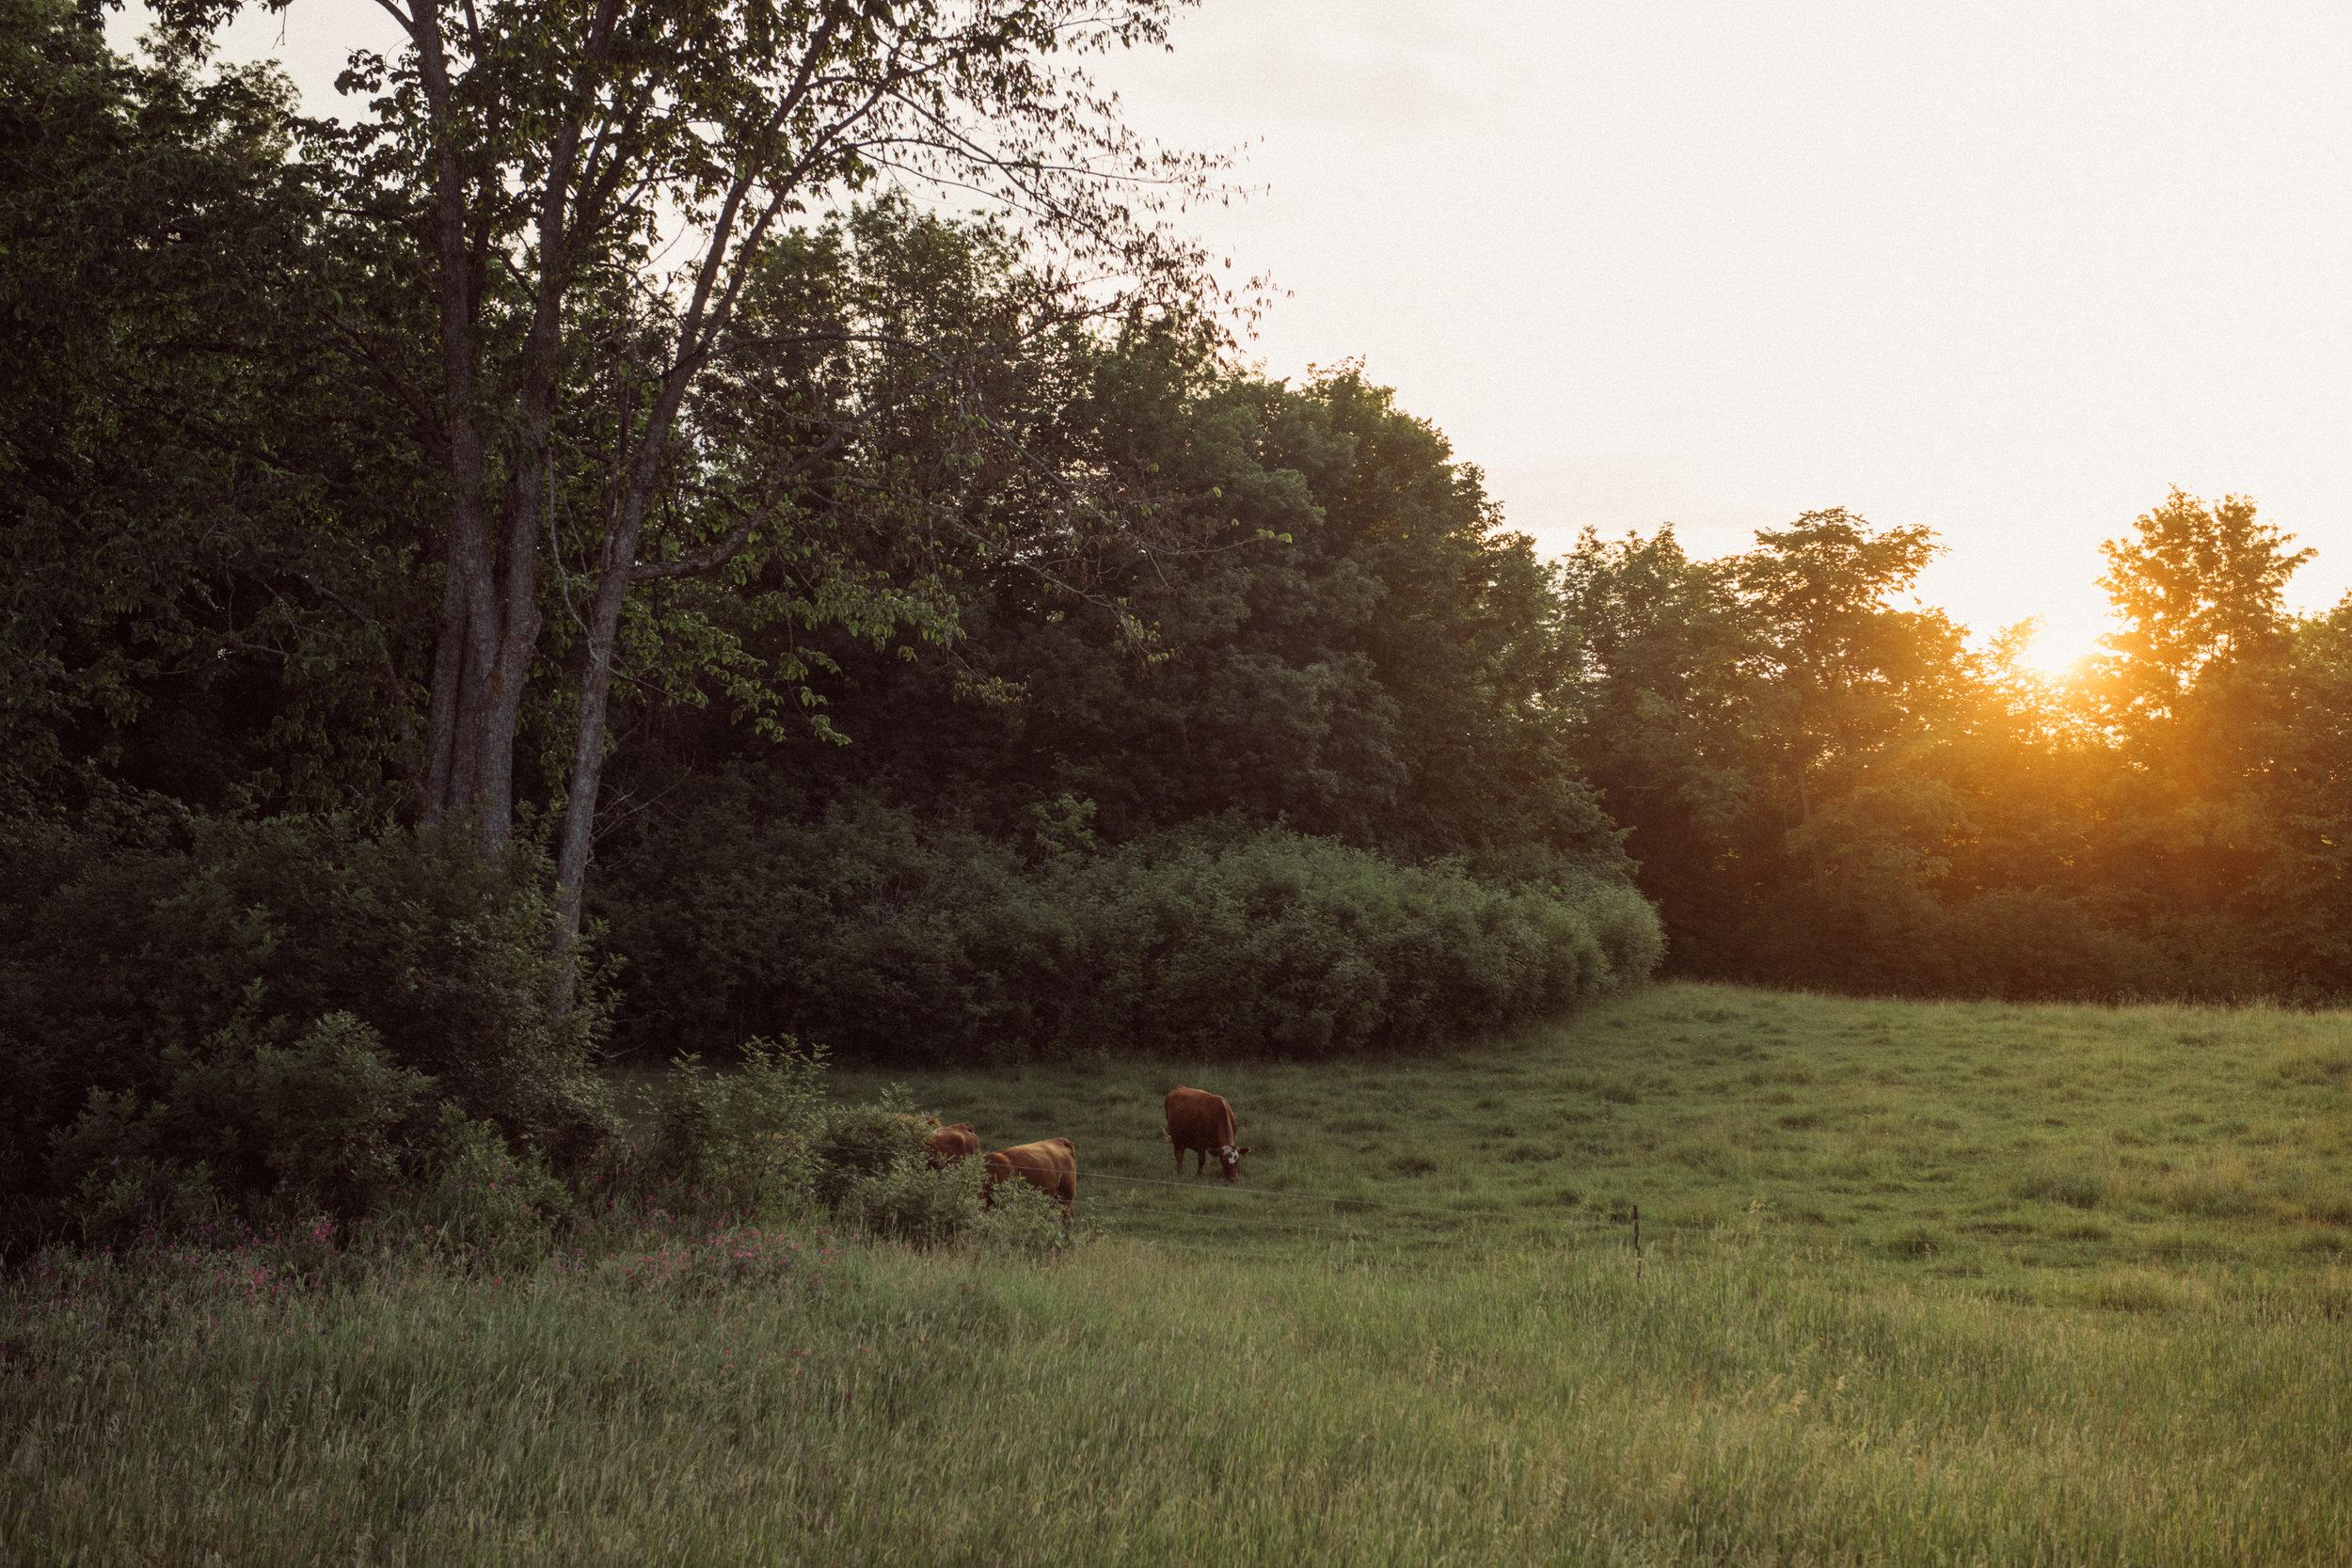 Rodan-Farmhouse-070719-022.jpg